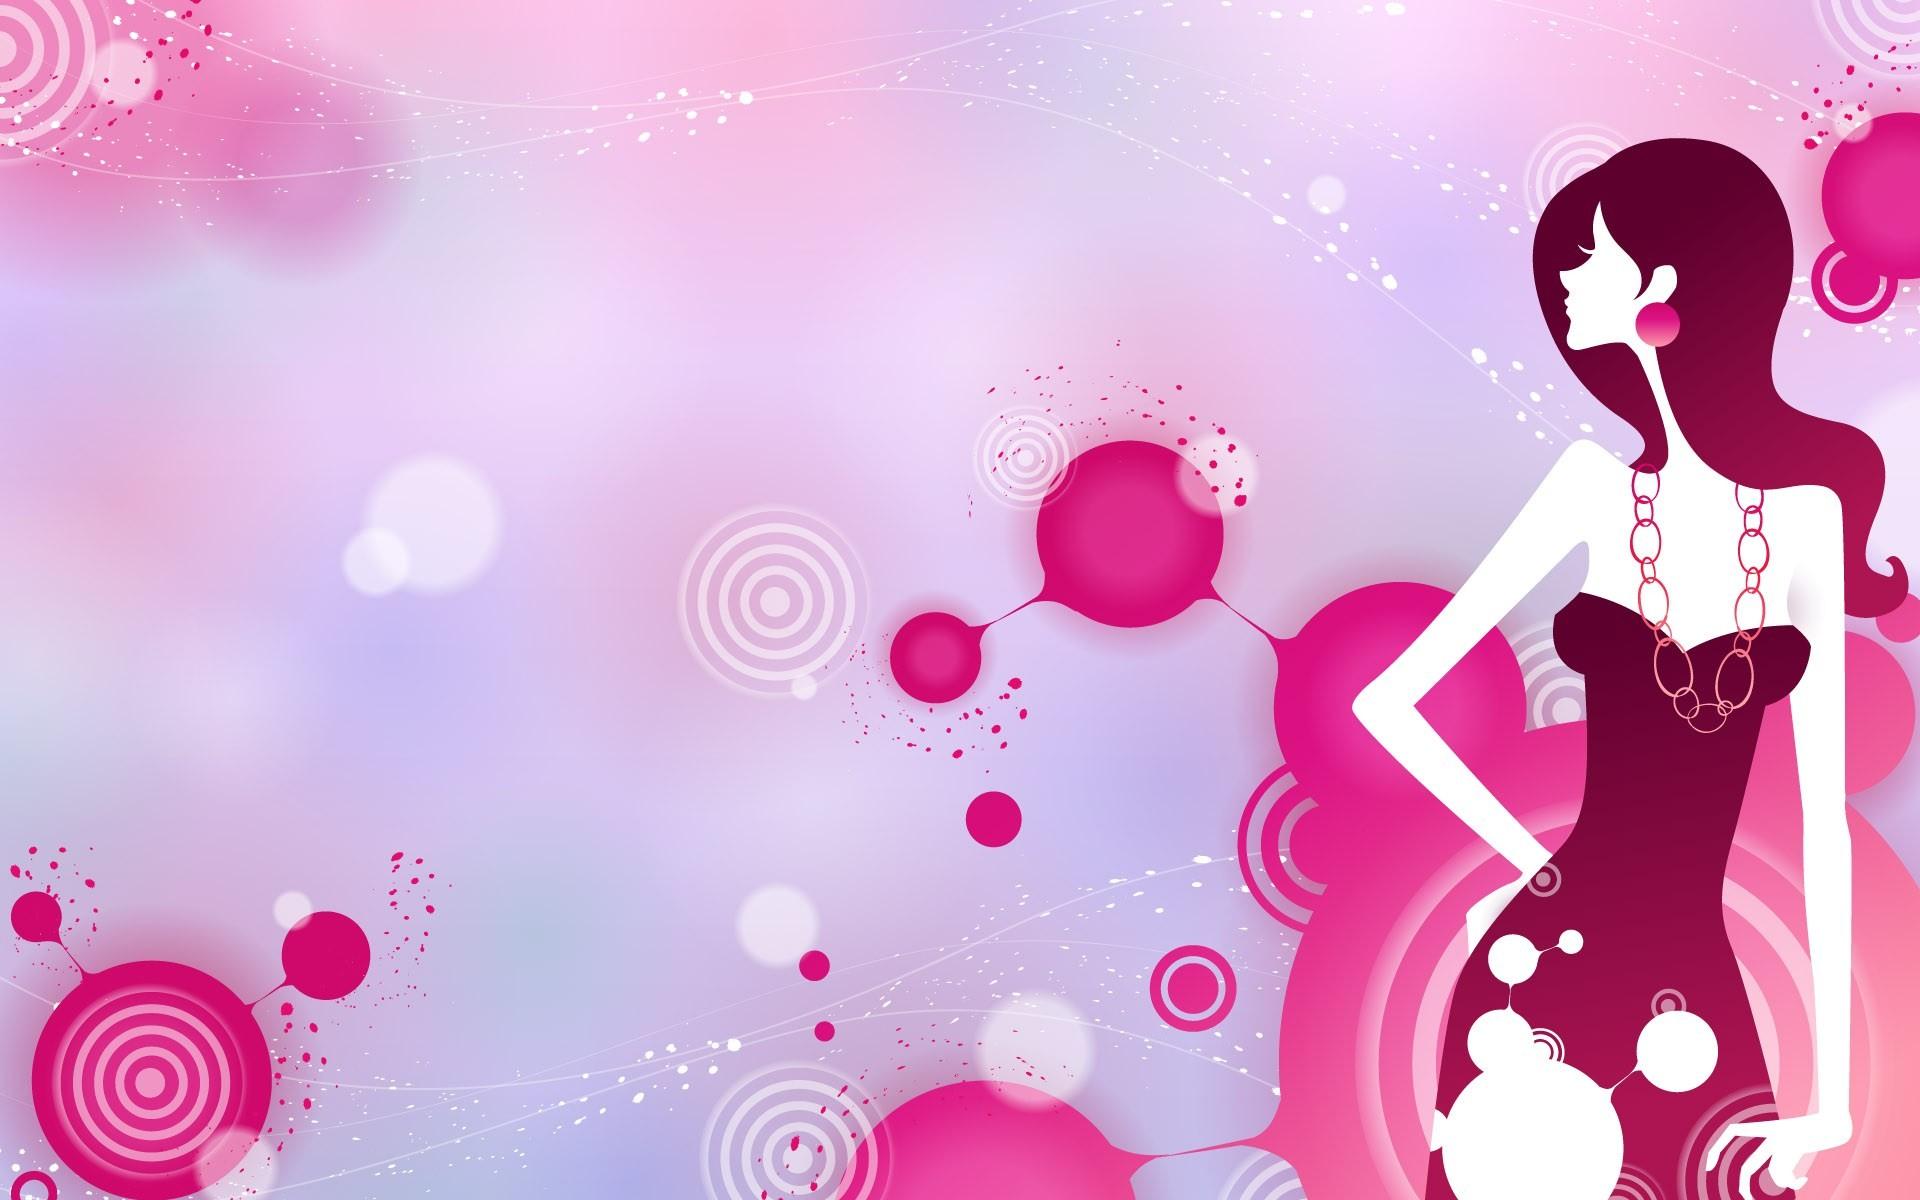 Pink Girly Desktop Wallpaper 56 Images